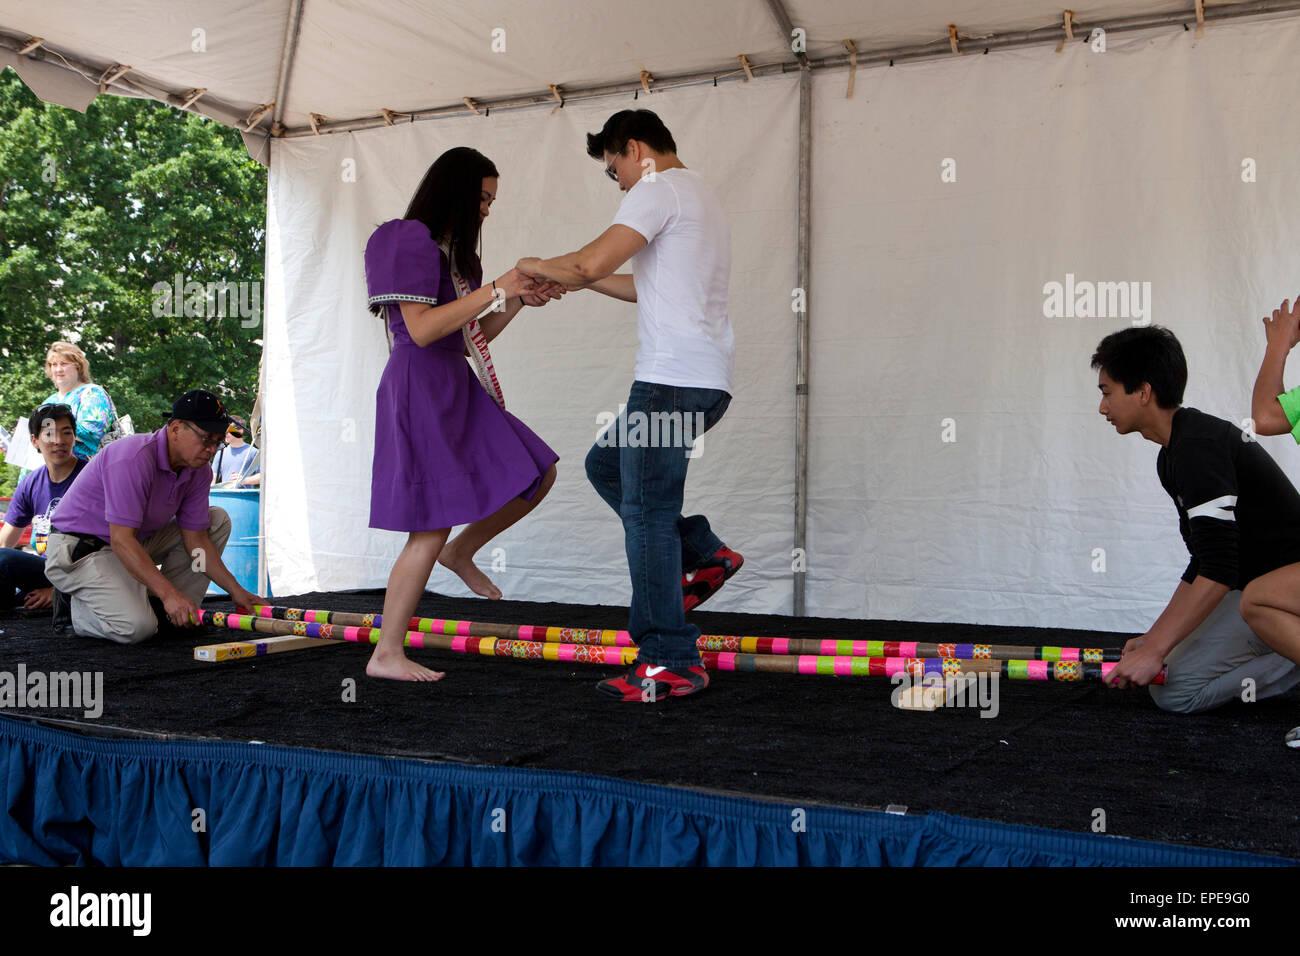 Tinikling (Philippine folk dance) performers on stage - National Asian Heritage Festival, Washington, DC USA - Stock Image